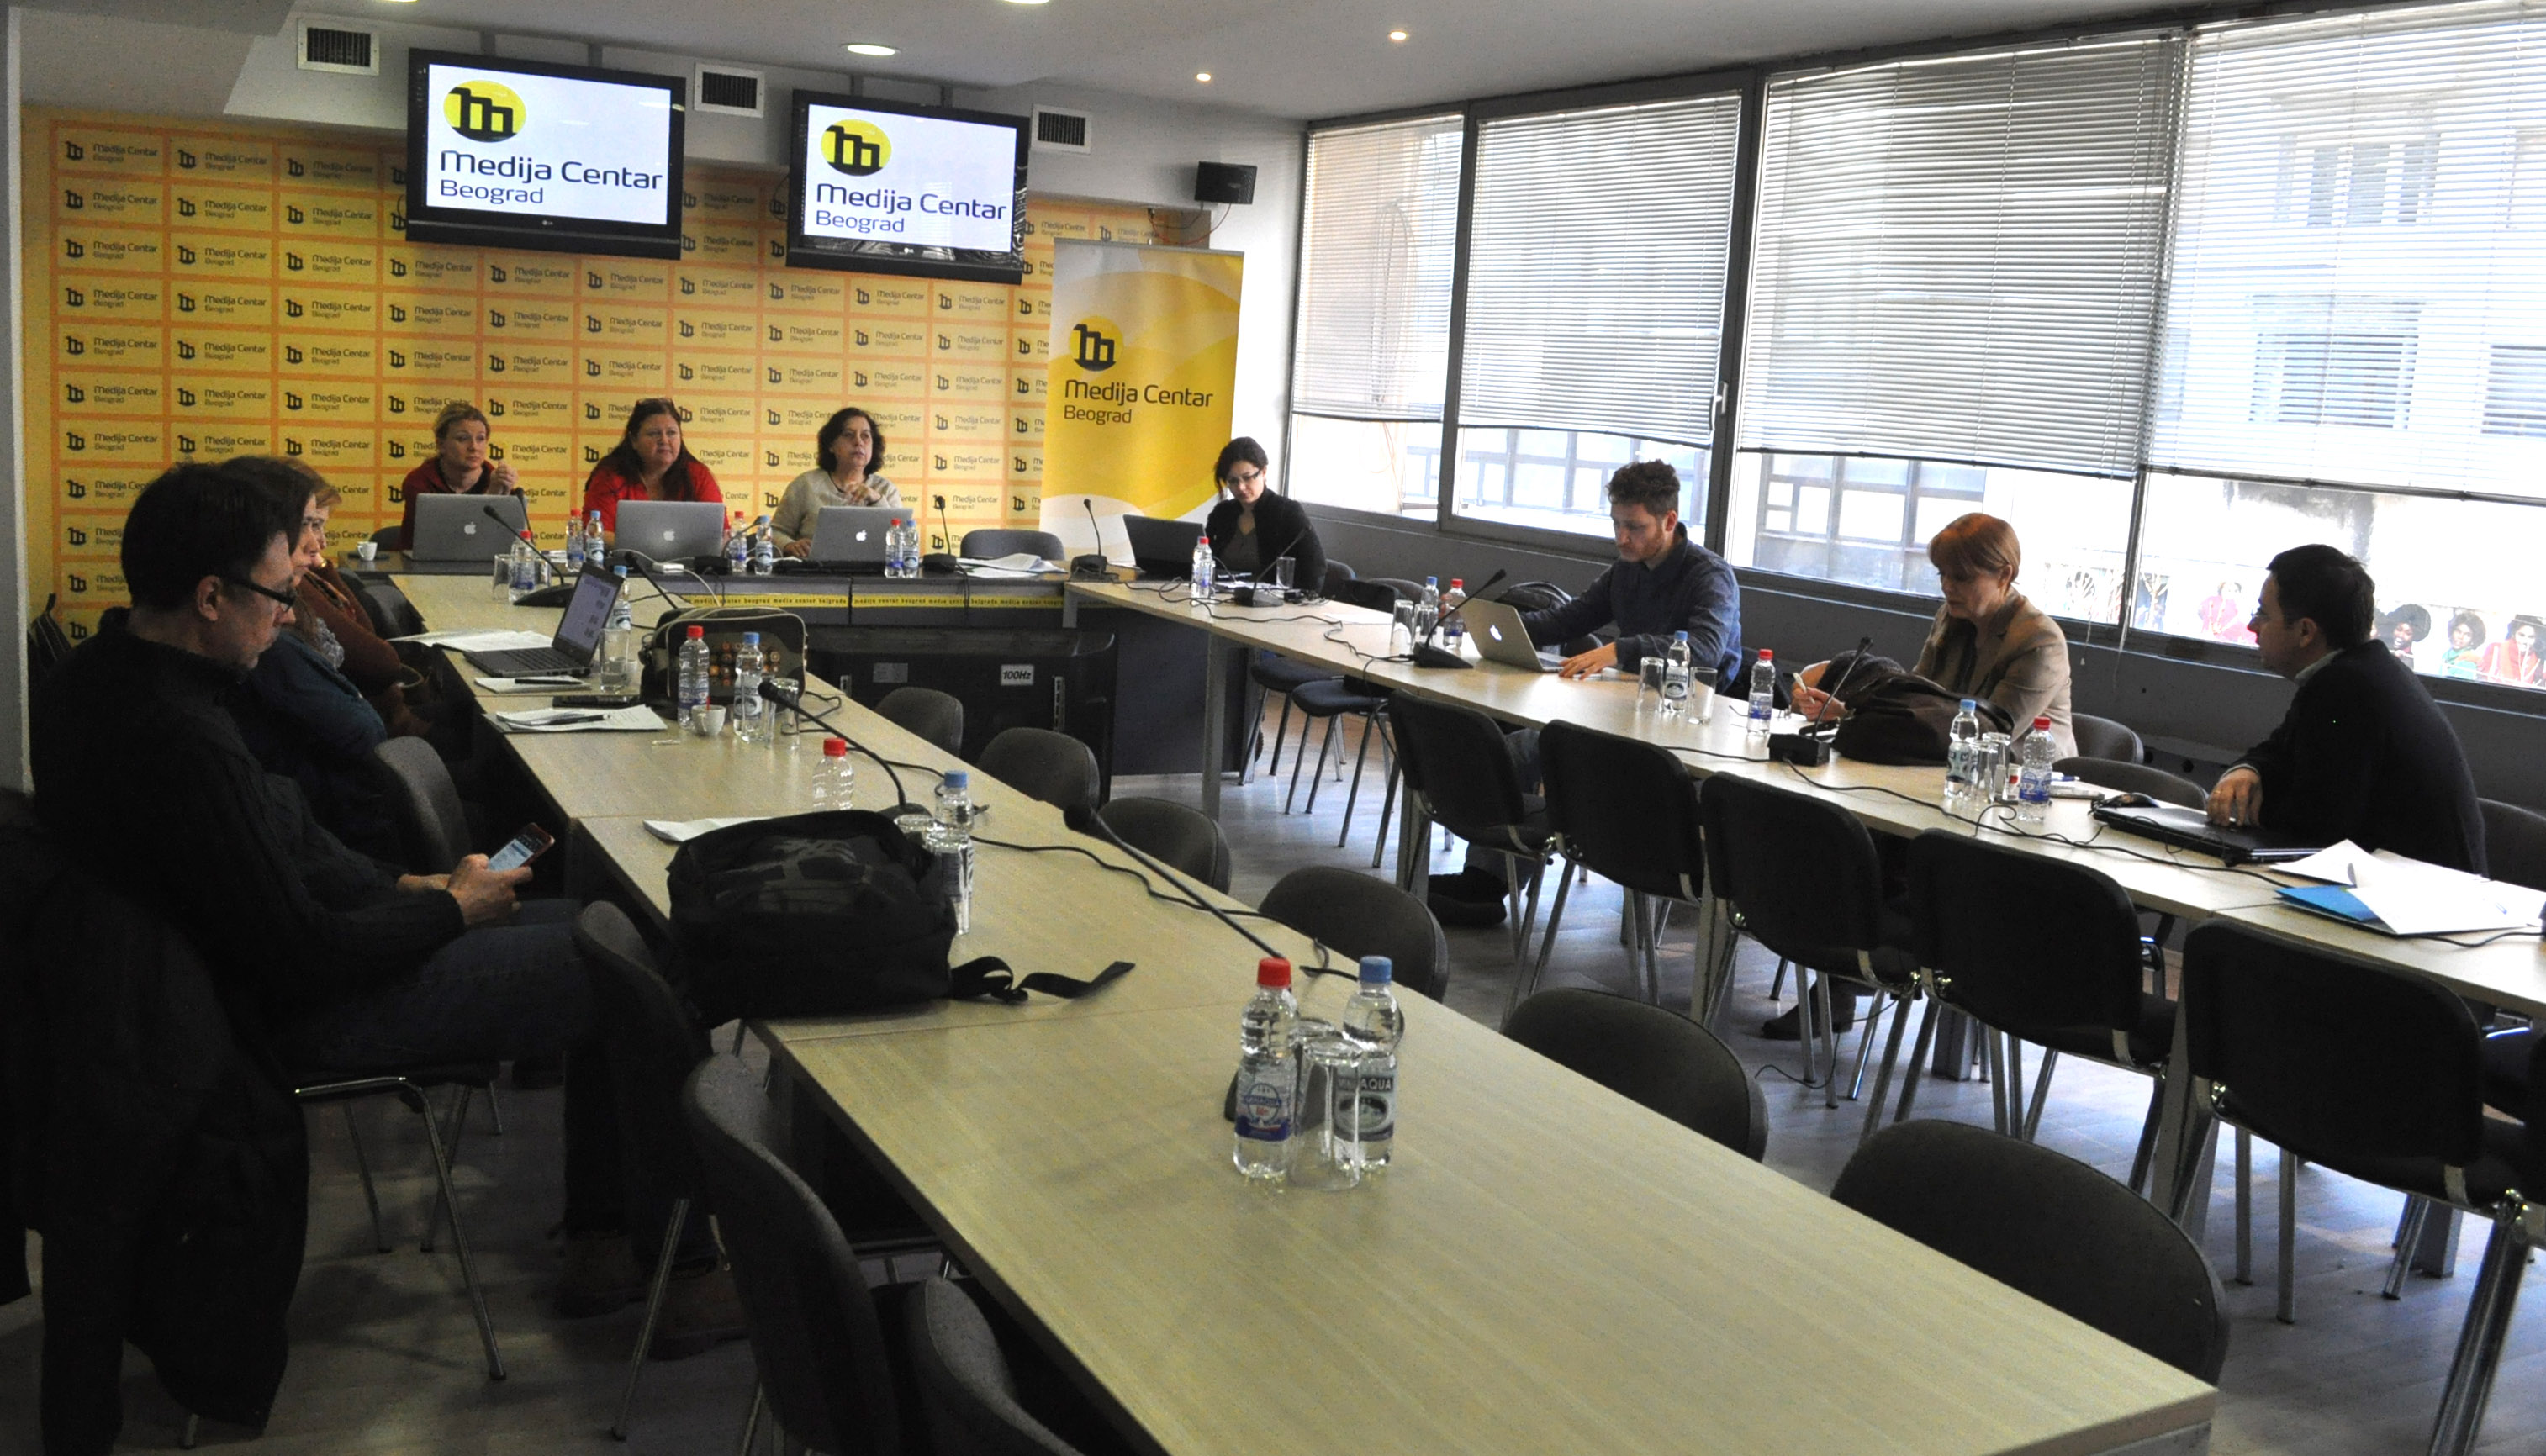 South East European Partnership for Media Development